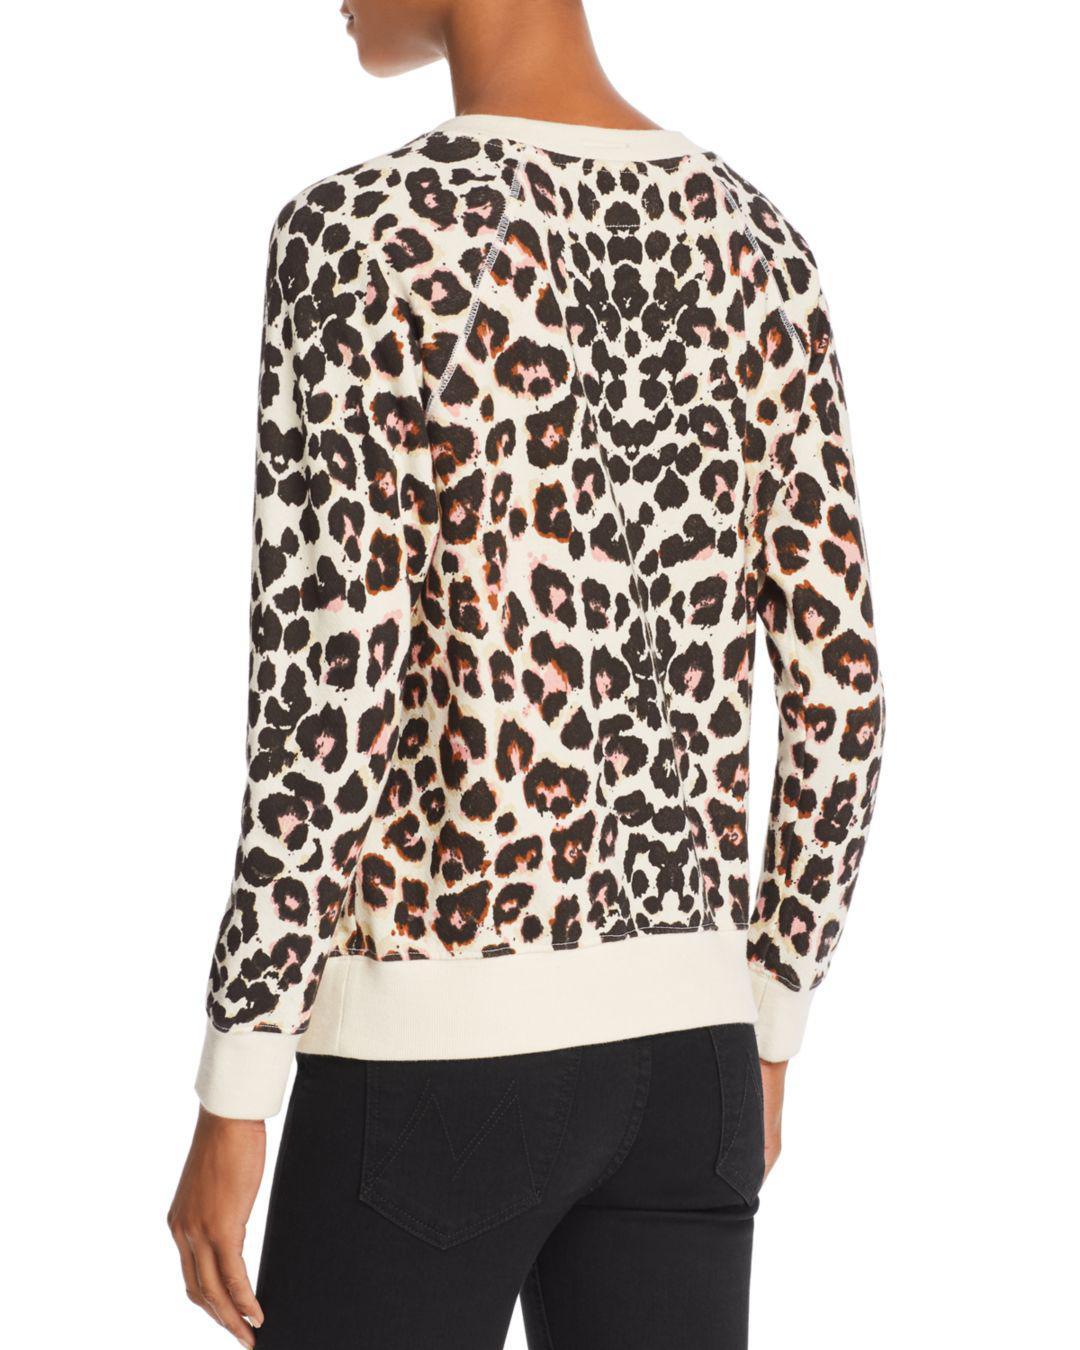 97b277ef62f4 Mother The Square Leopard Print Sweatshirt - Lyst